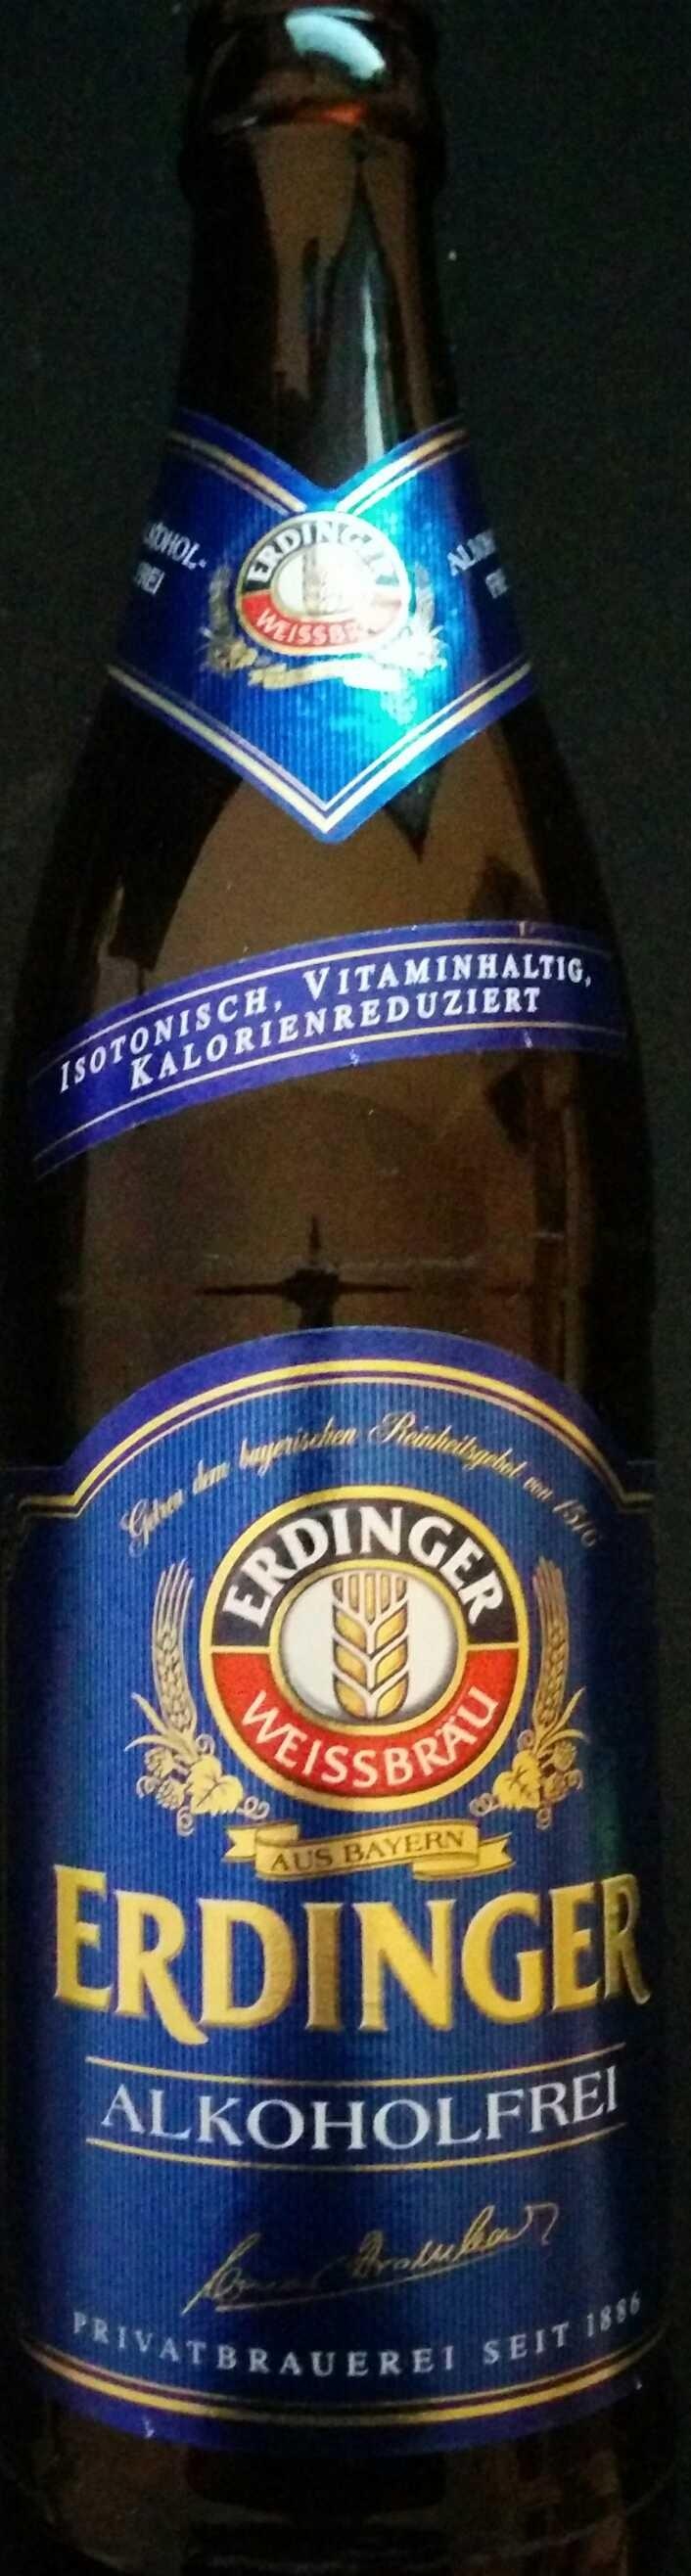 Erdinger Alkoholfrei - Product - de